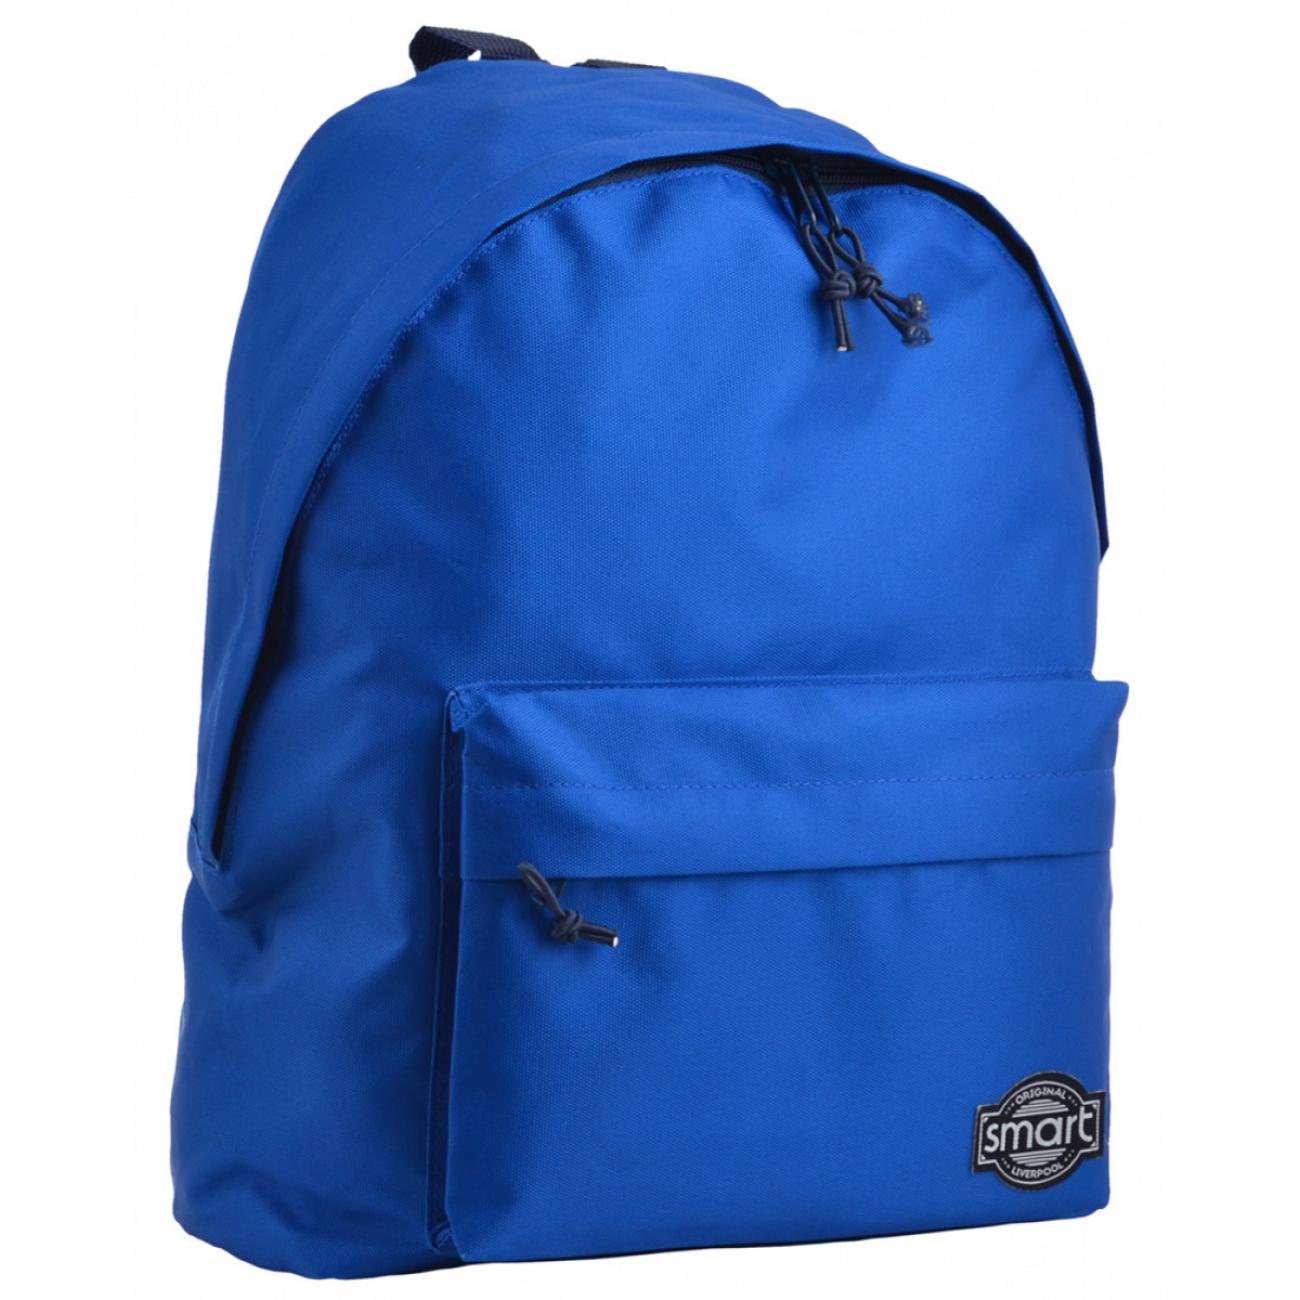 Рюкзак молодежный Smart ST-29 Azure, 37*28*11